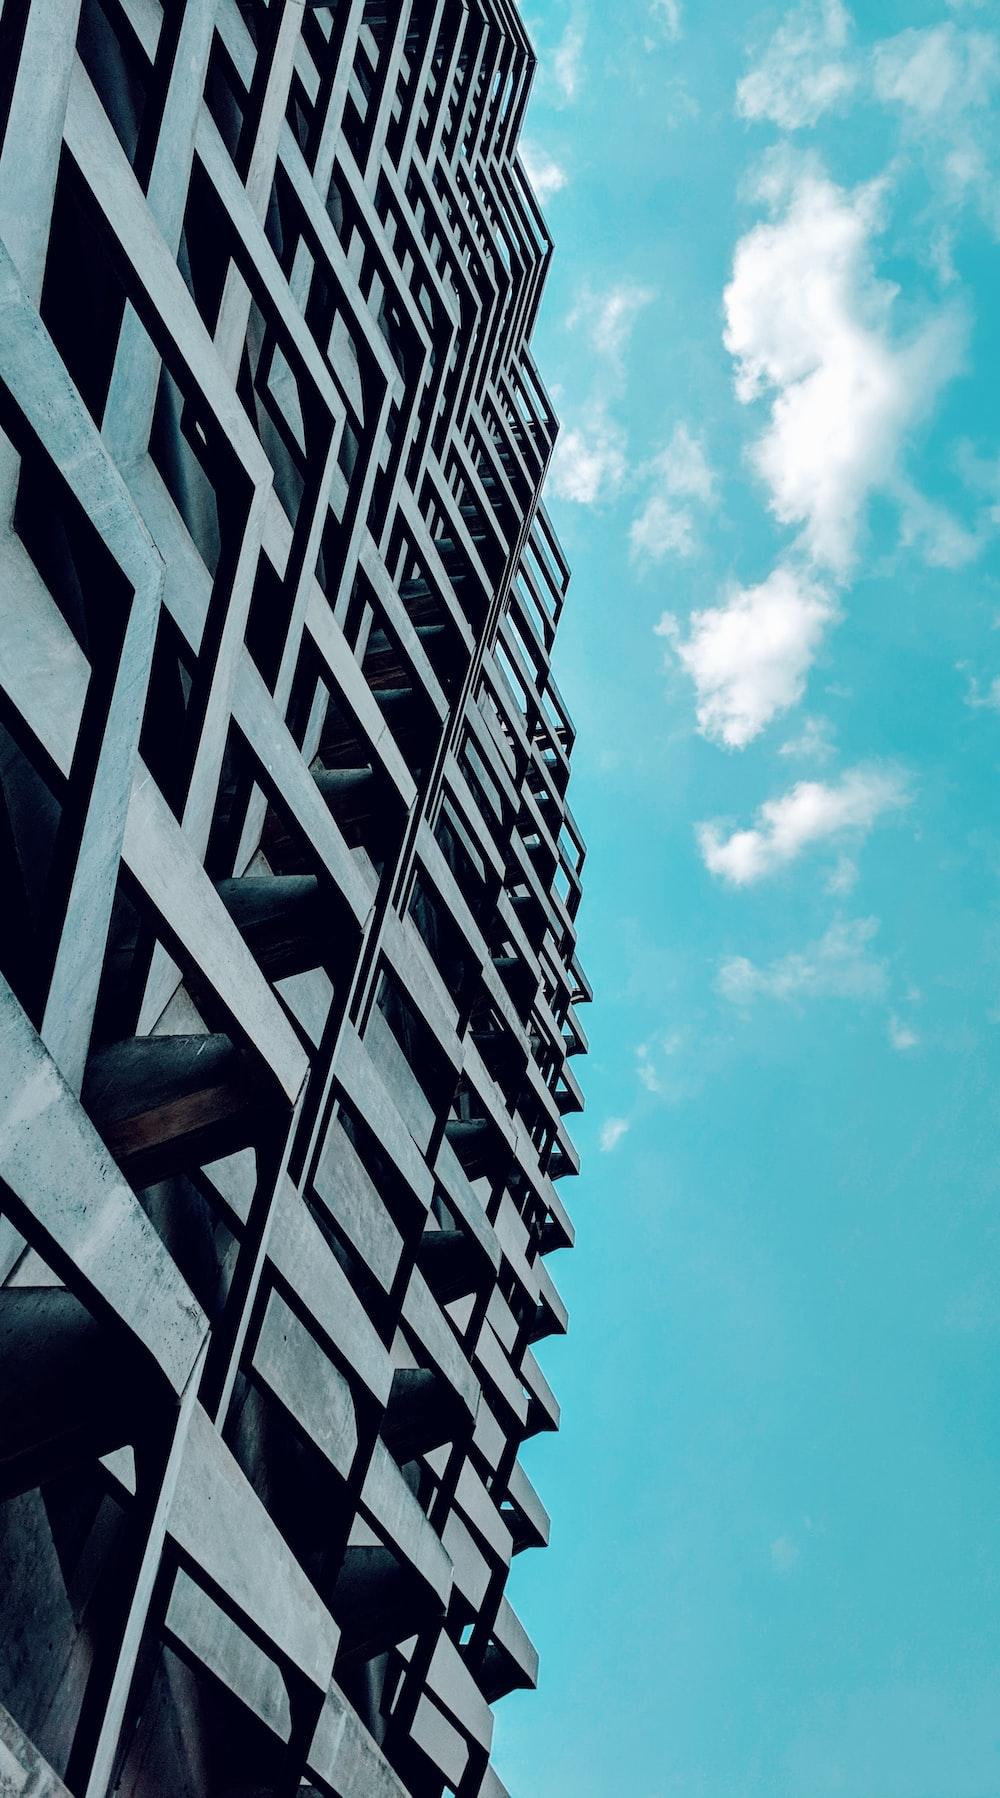 grey multi-storey building under blue sky